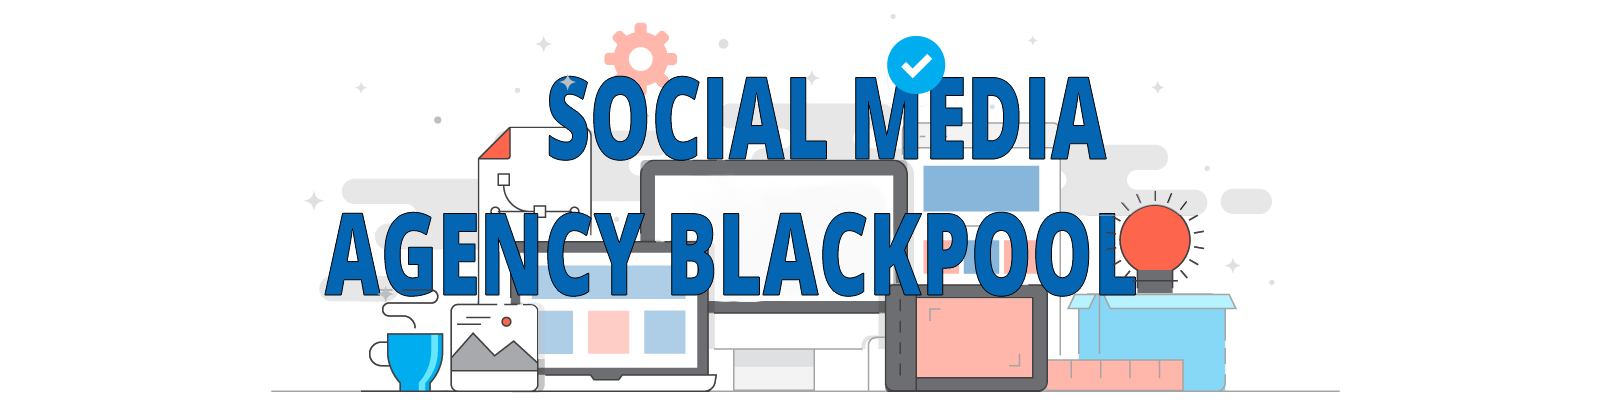 social media agency blackpool to increase engagements